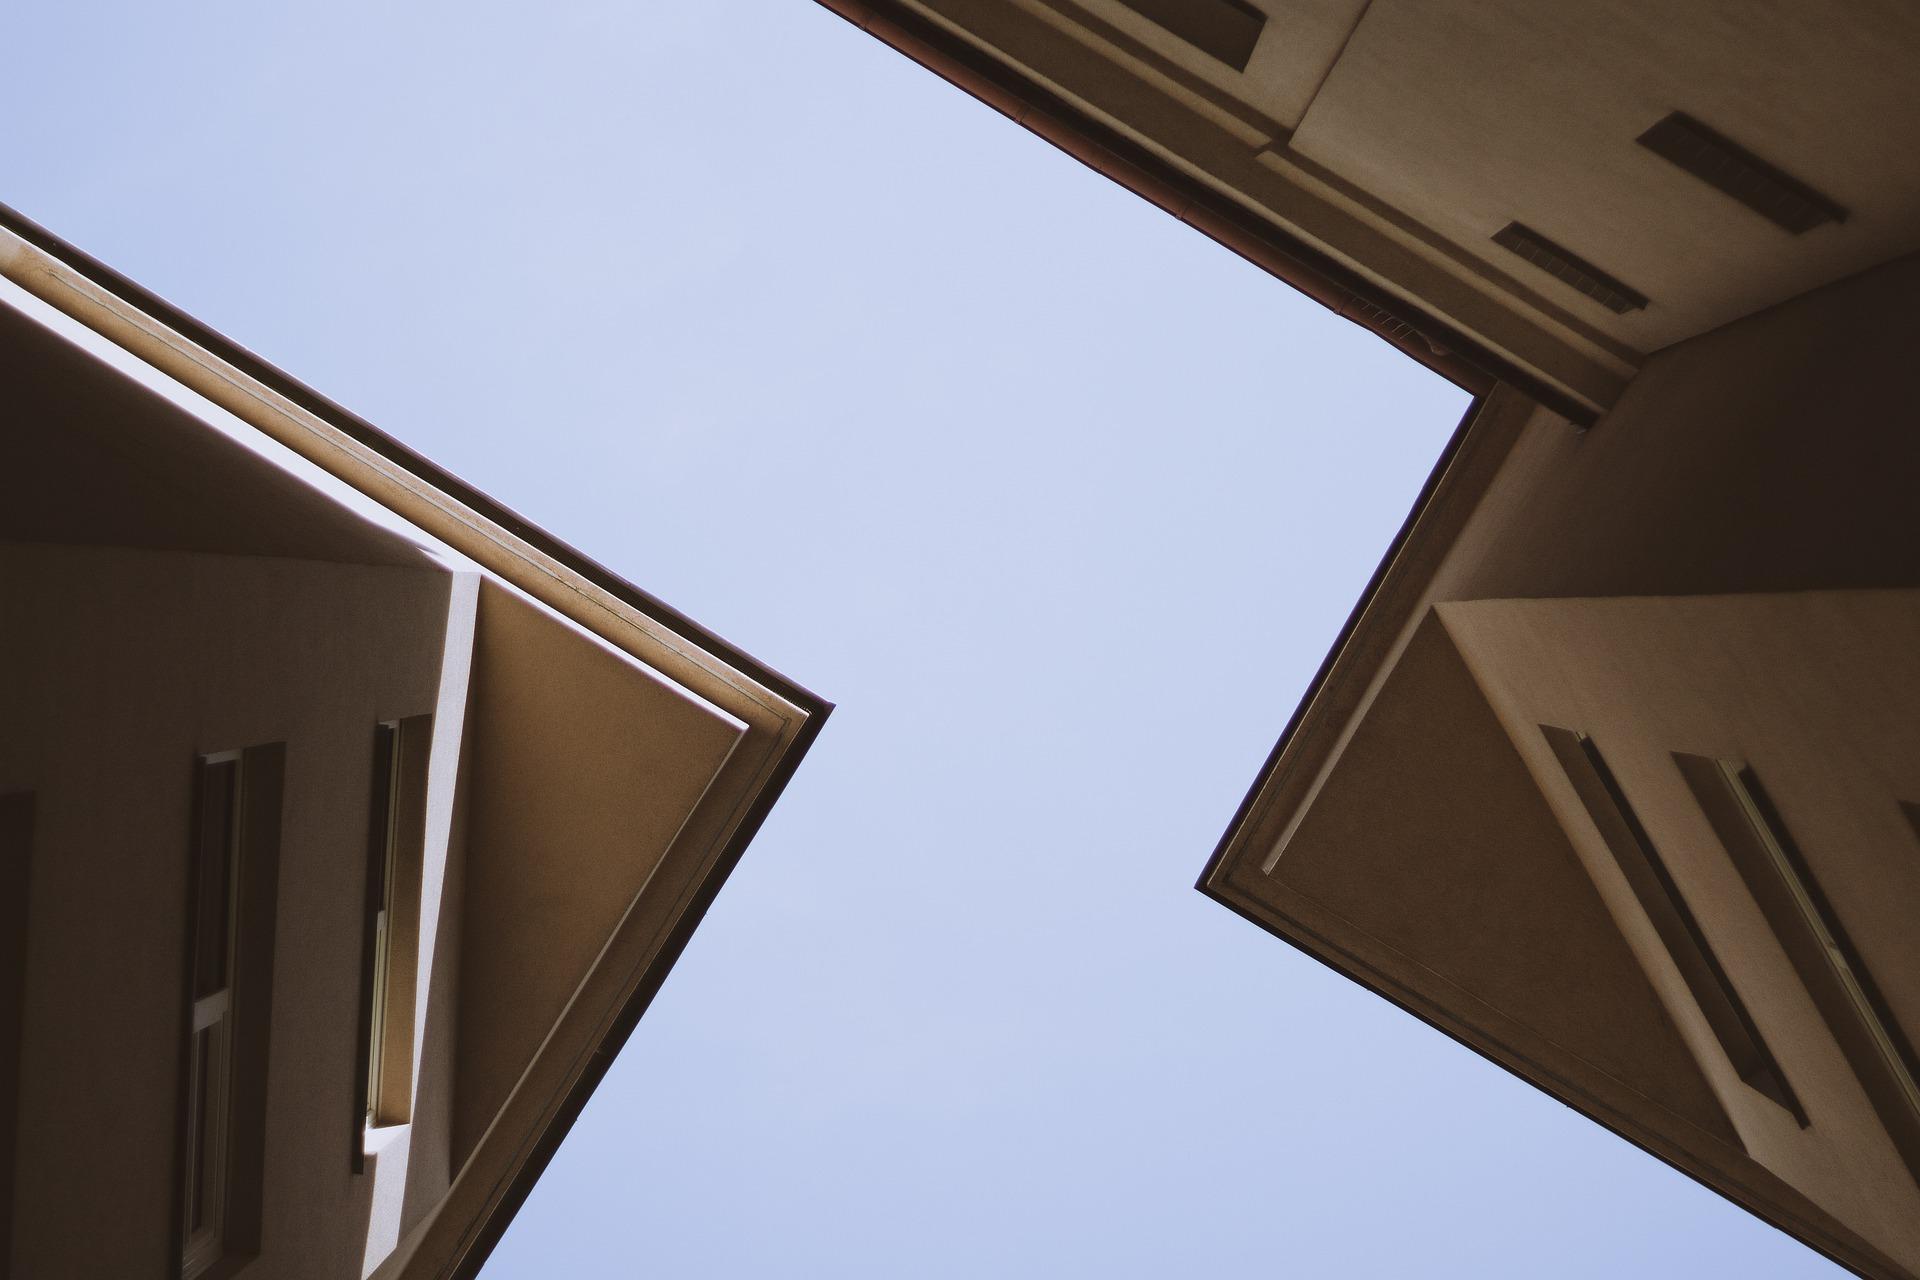 roof eavestrough